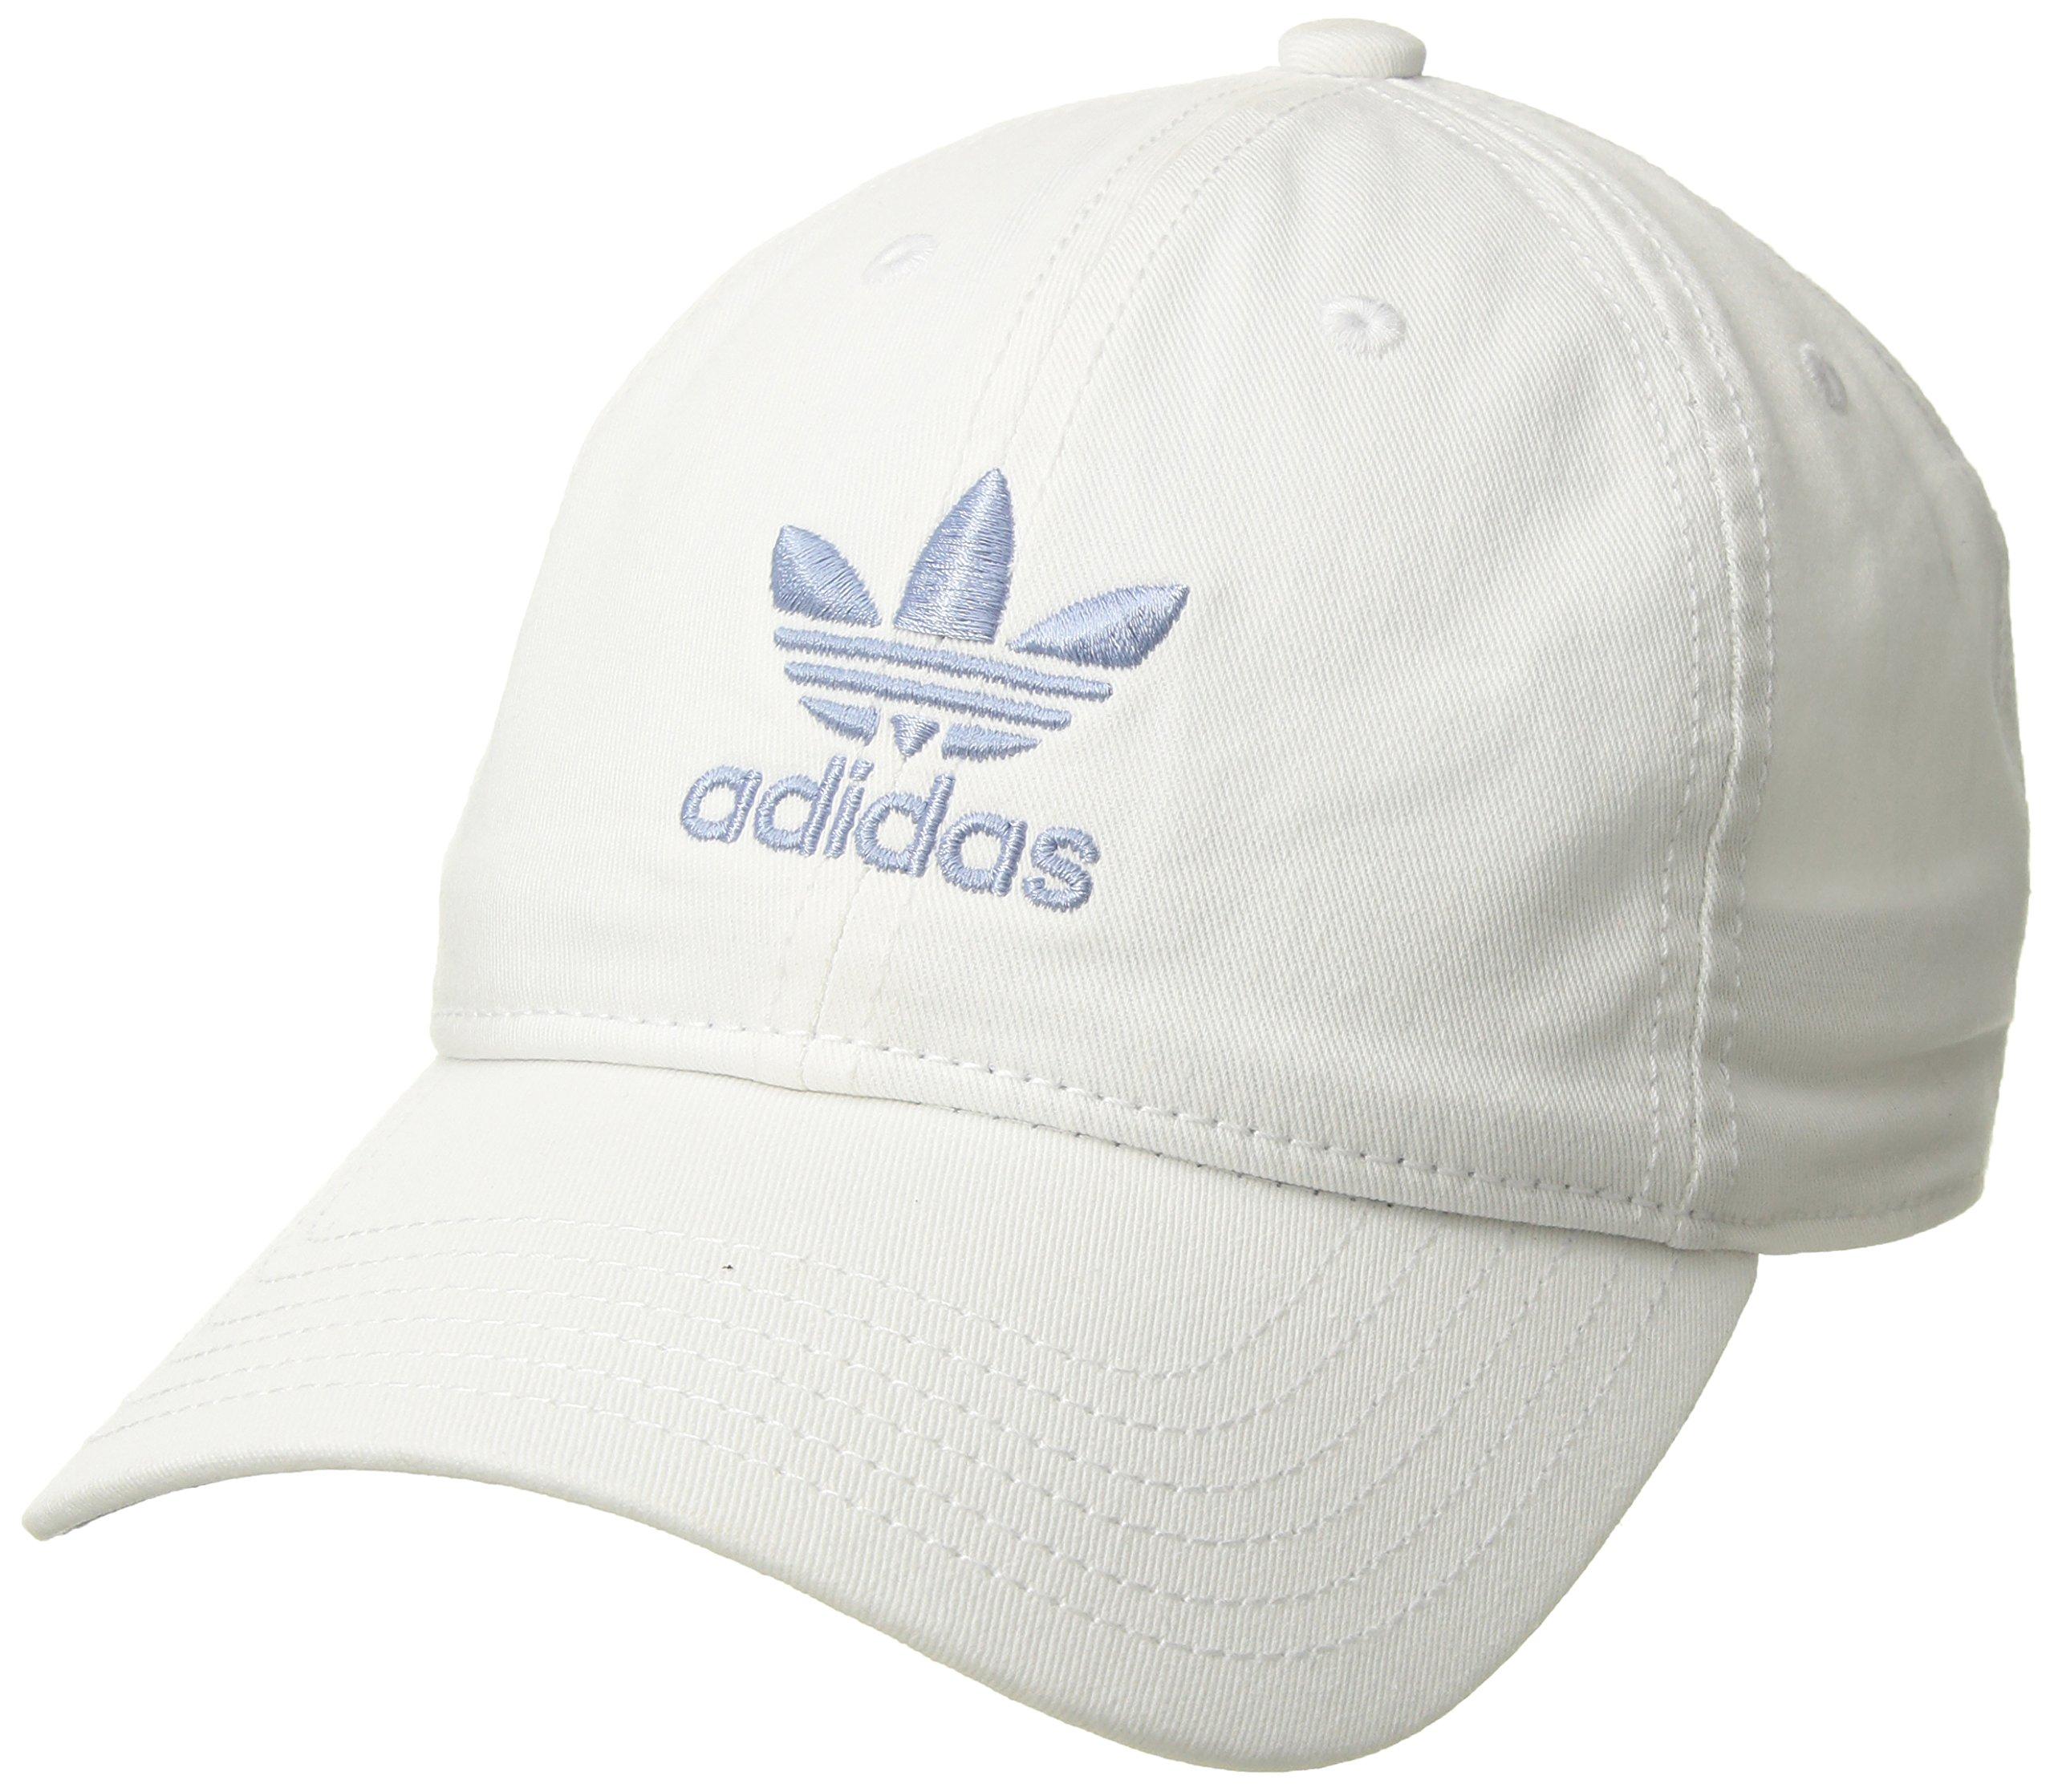 adidas Women's Originals Relaxed Adjustable Strapback Cap, White/Chalk Blue, One Size